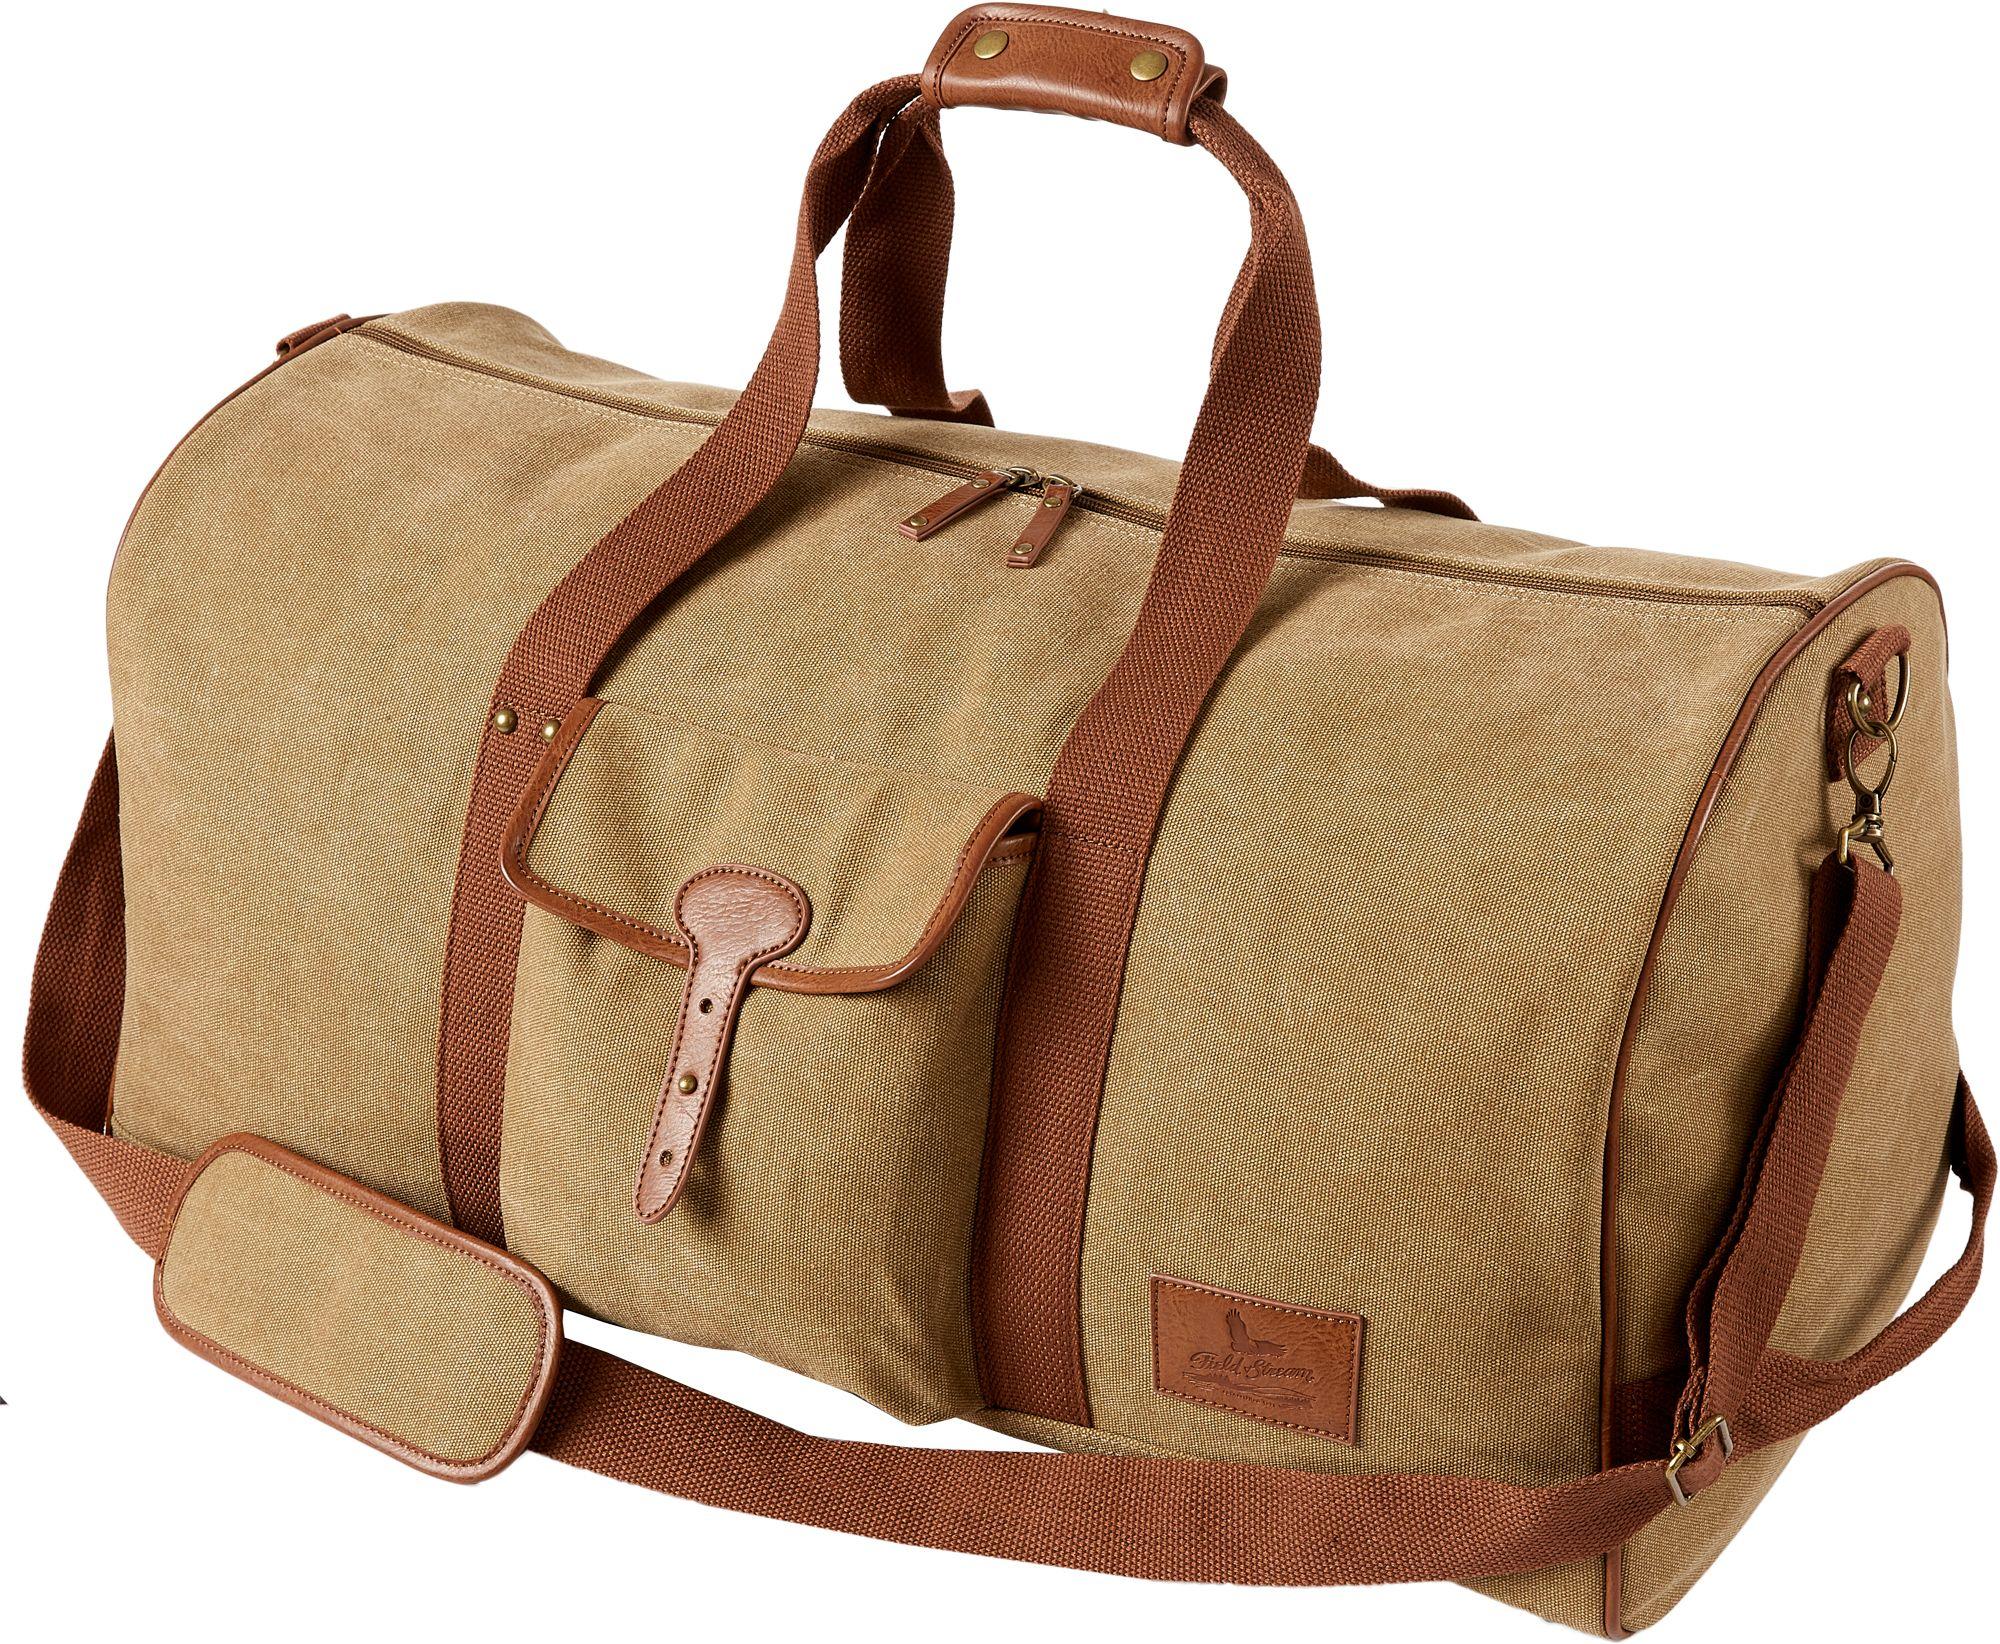 Field & Stream Canvas Duffle Bag | Field & Stream